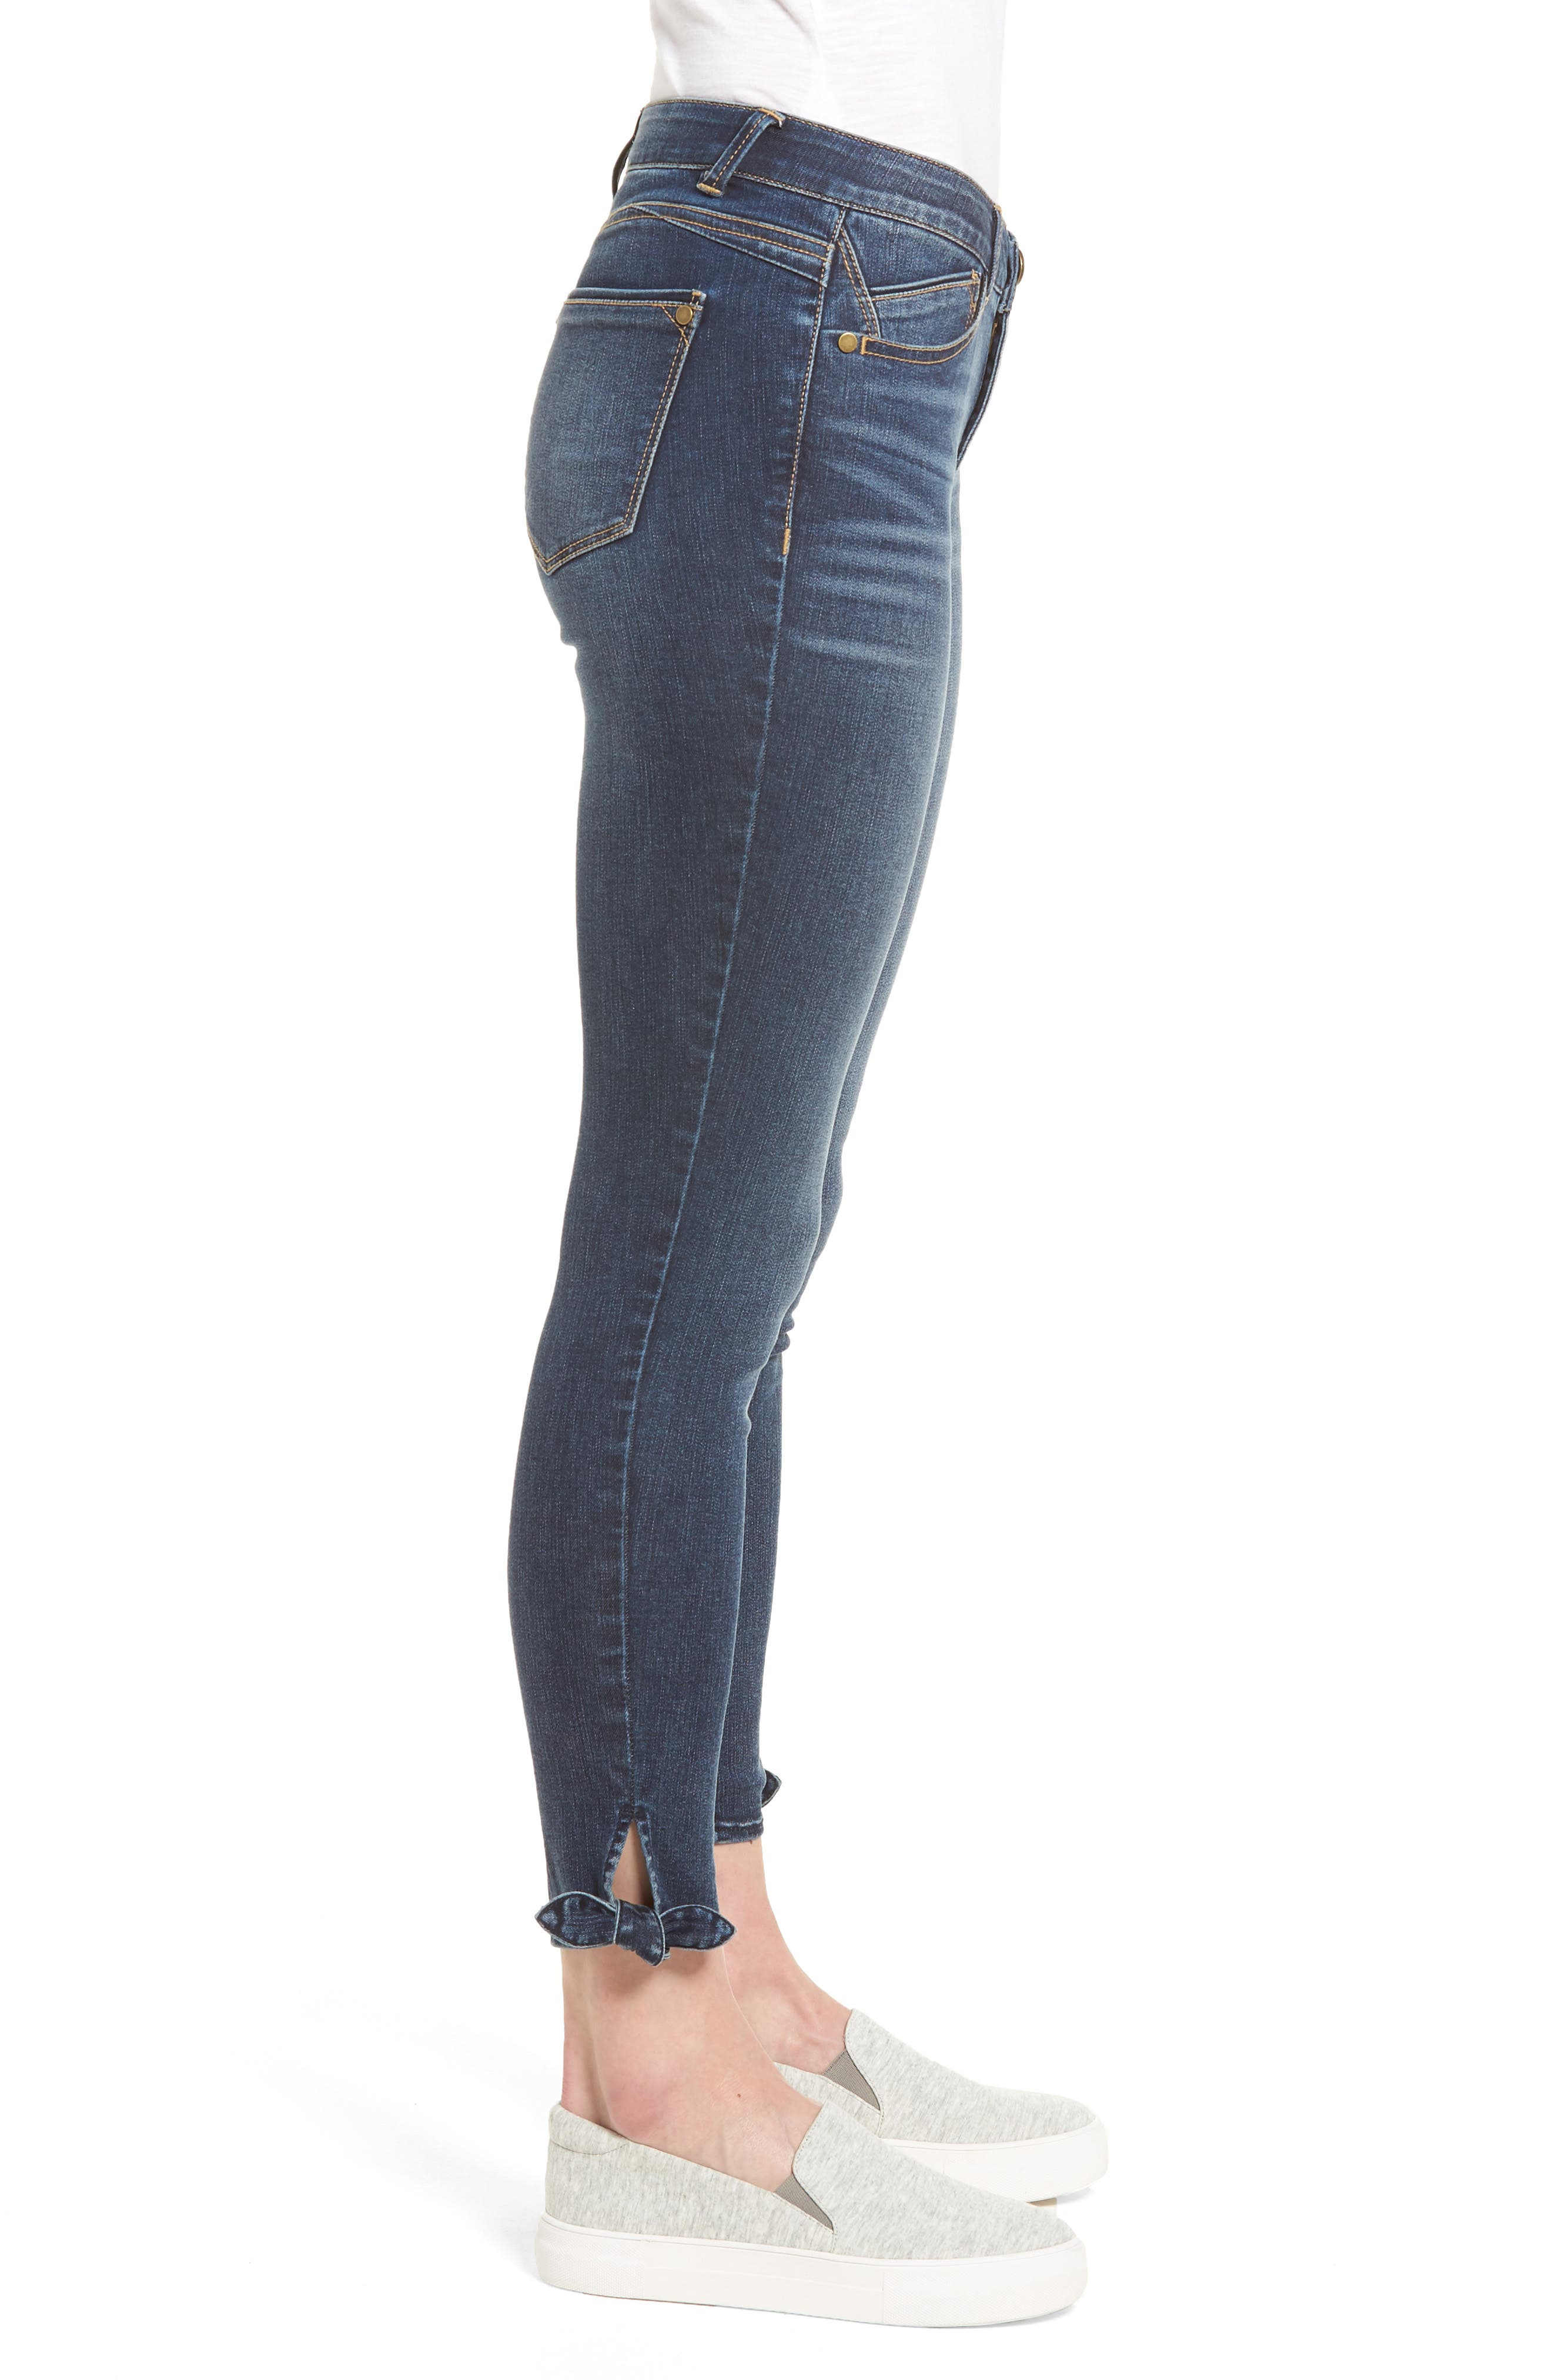 Ab-solution Ankle Skinny Skimmer Jeans,                             Alternate thumbnail 3, color,